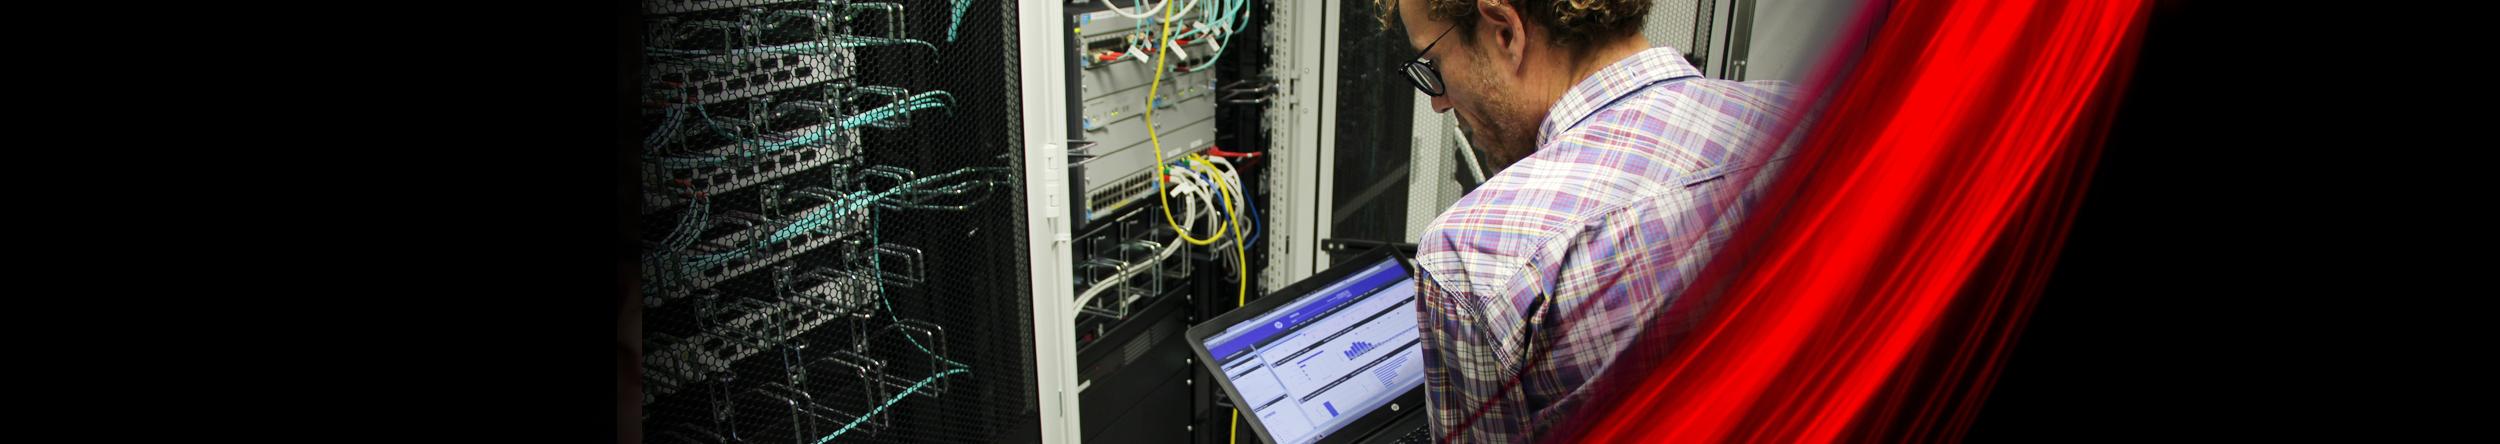 CR-Network_sliders1.2